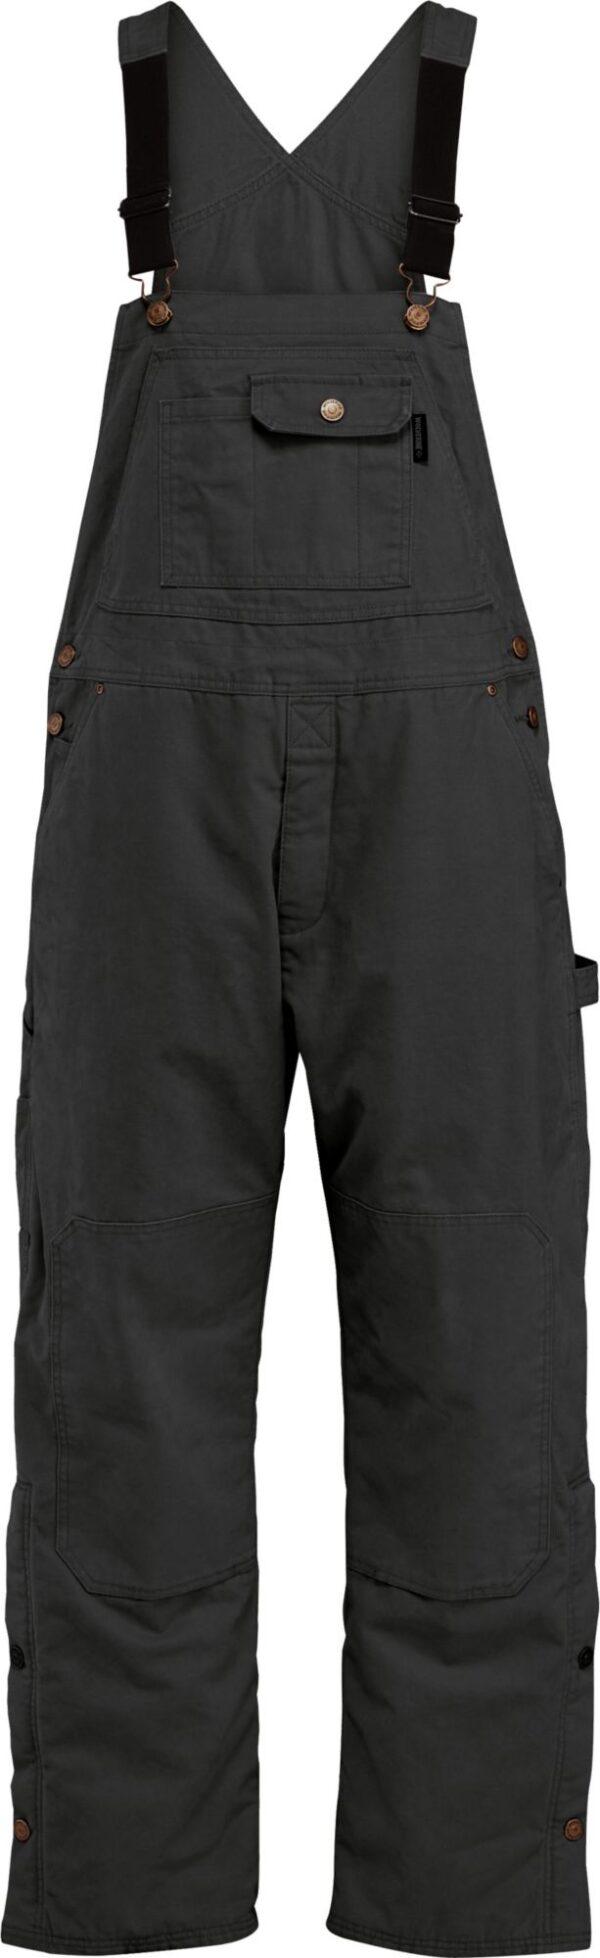 Wolverine Men's Sawmill Insulated Bib, XL, Black